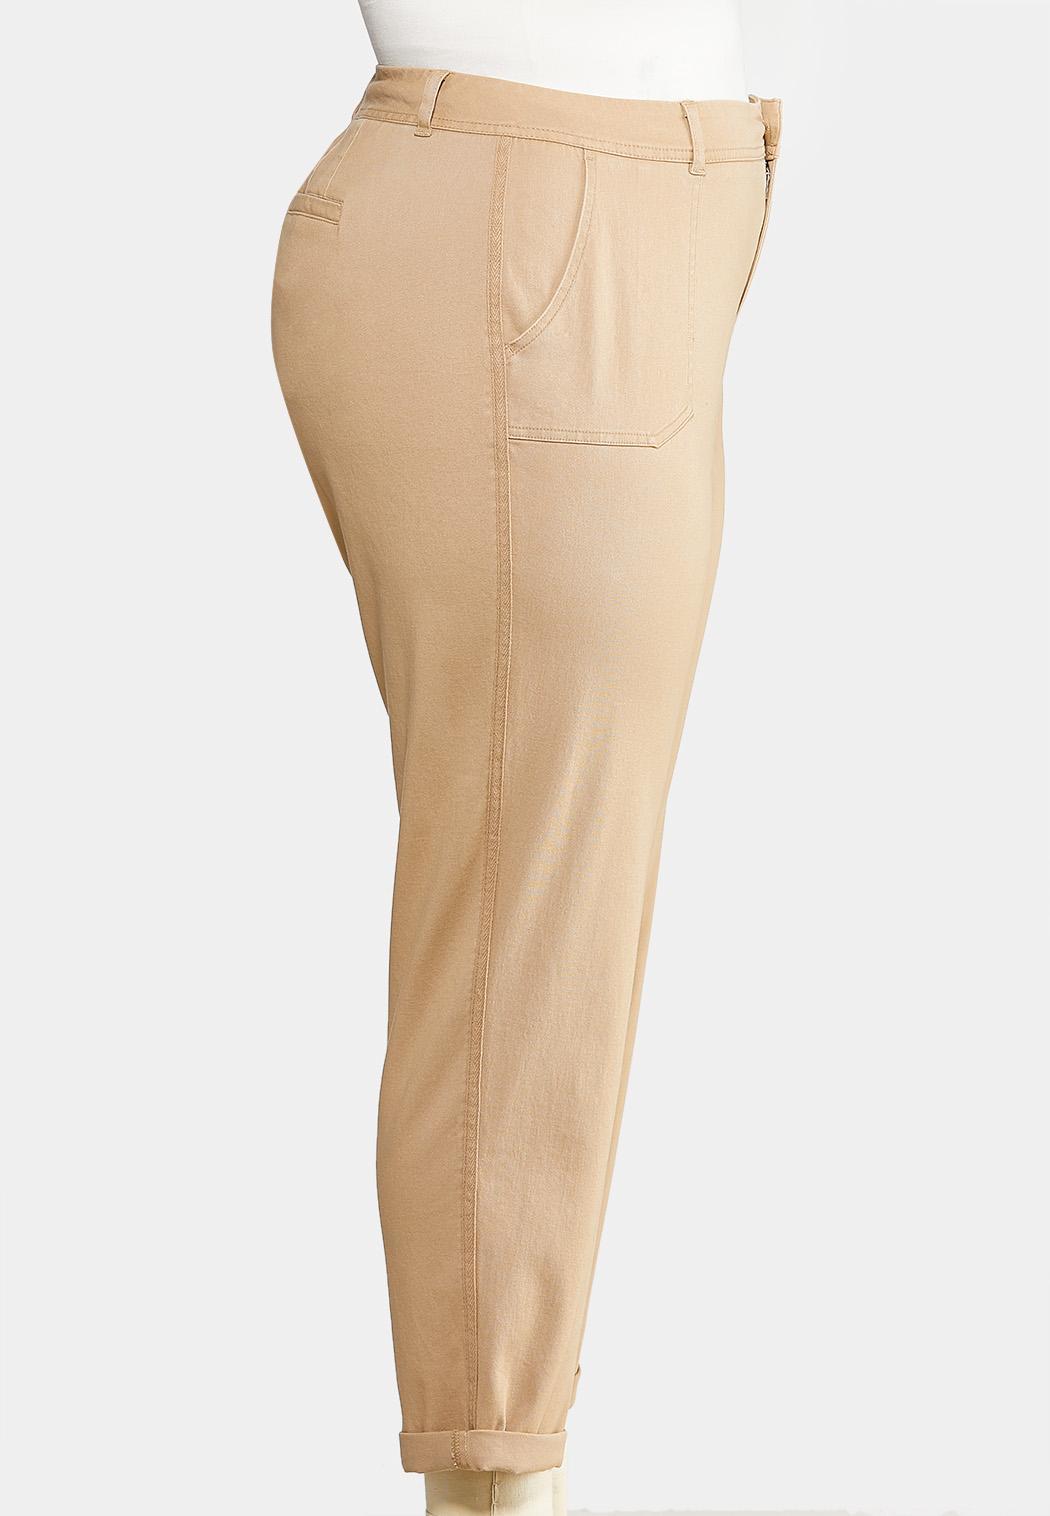 Plus Size Utility Chino Pants (Item #43901031)